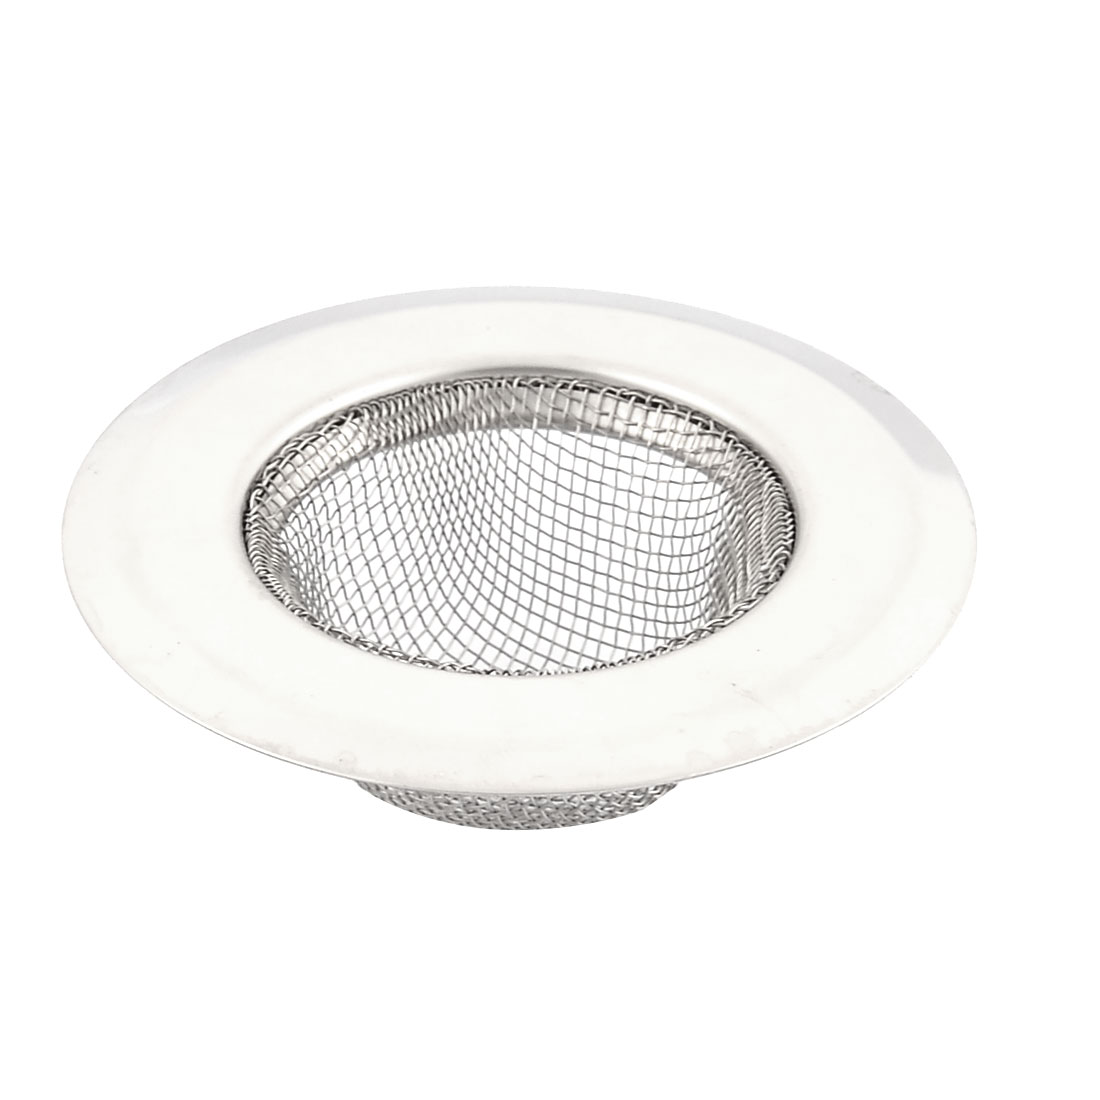 Home Kitchen Metal Sink Drain Strainer Screen Stopper Filter Basket 7cm Dia by Unique-Bargains